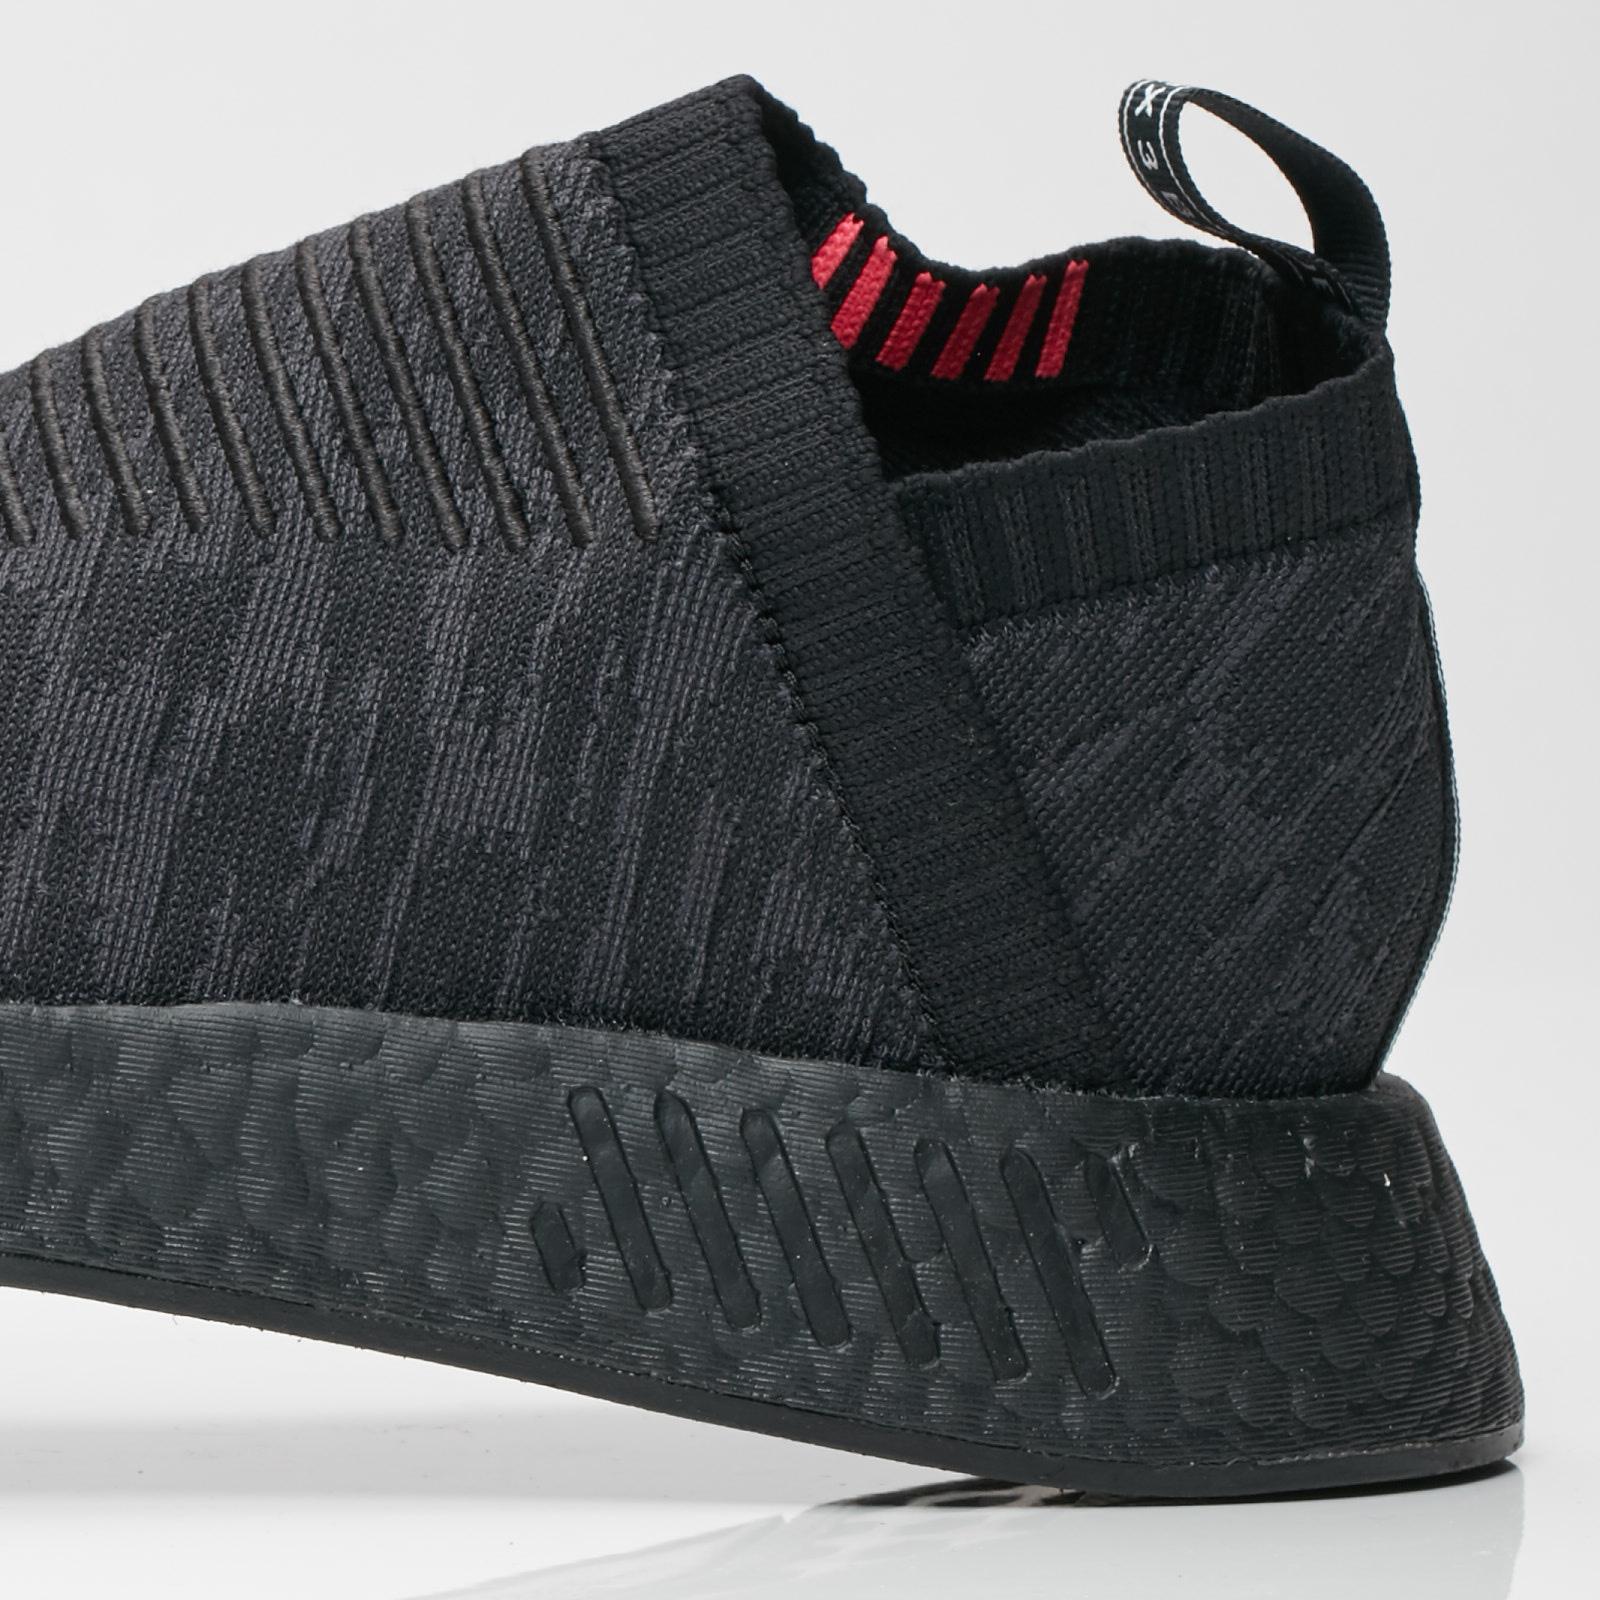 453ceff8033fa adidas NMD CS2 PK - Cq2373 - Sneakersnstuff